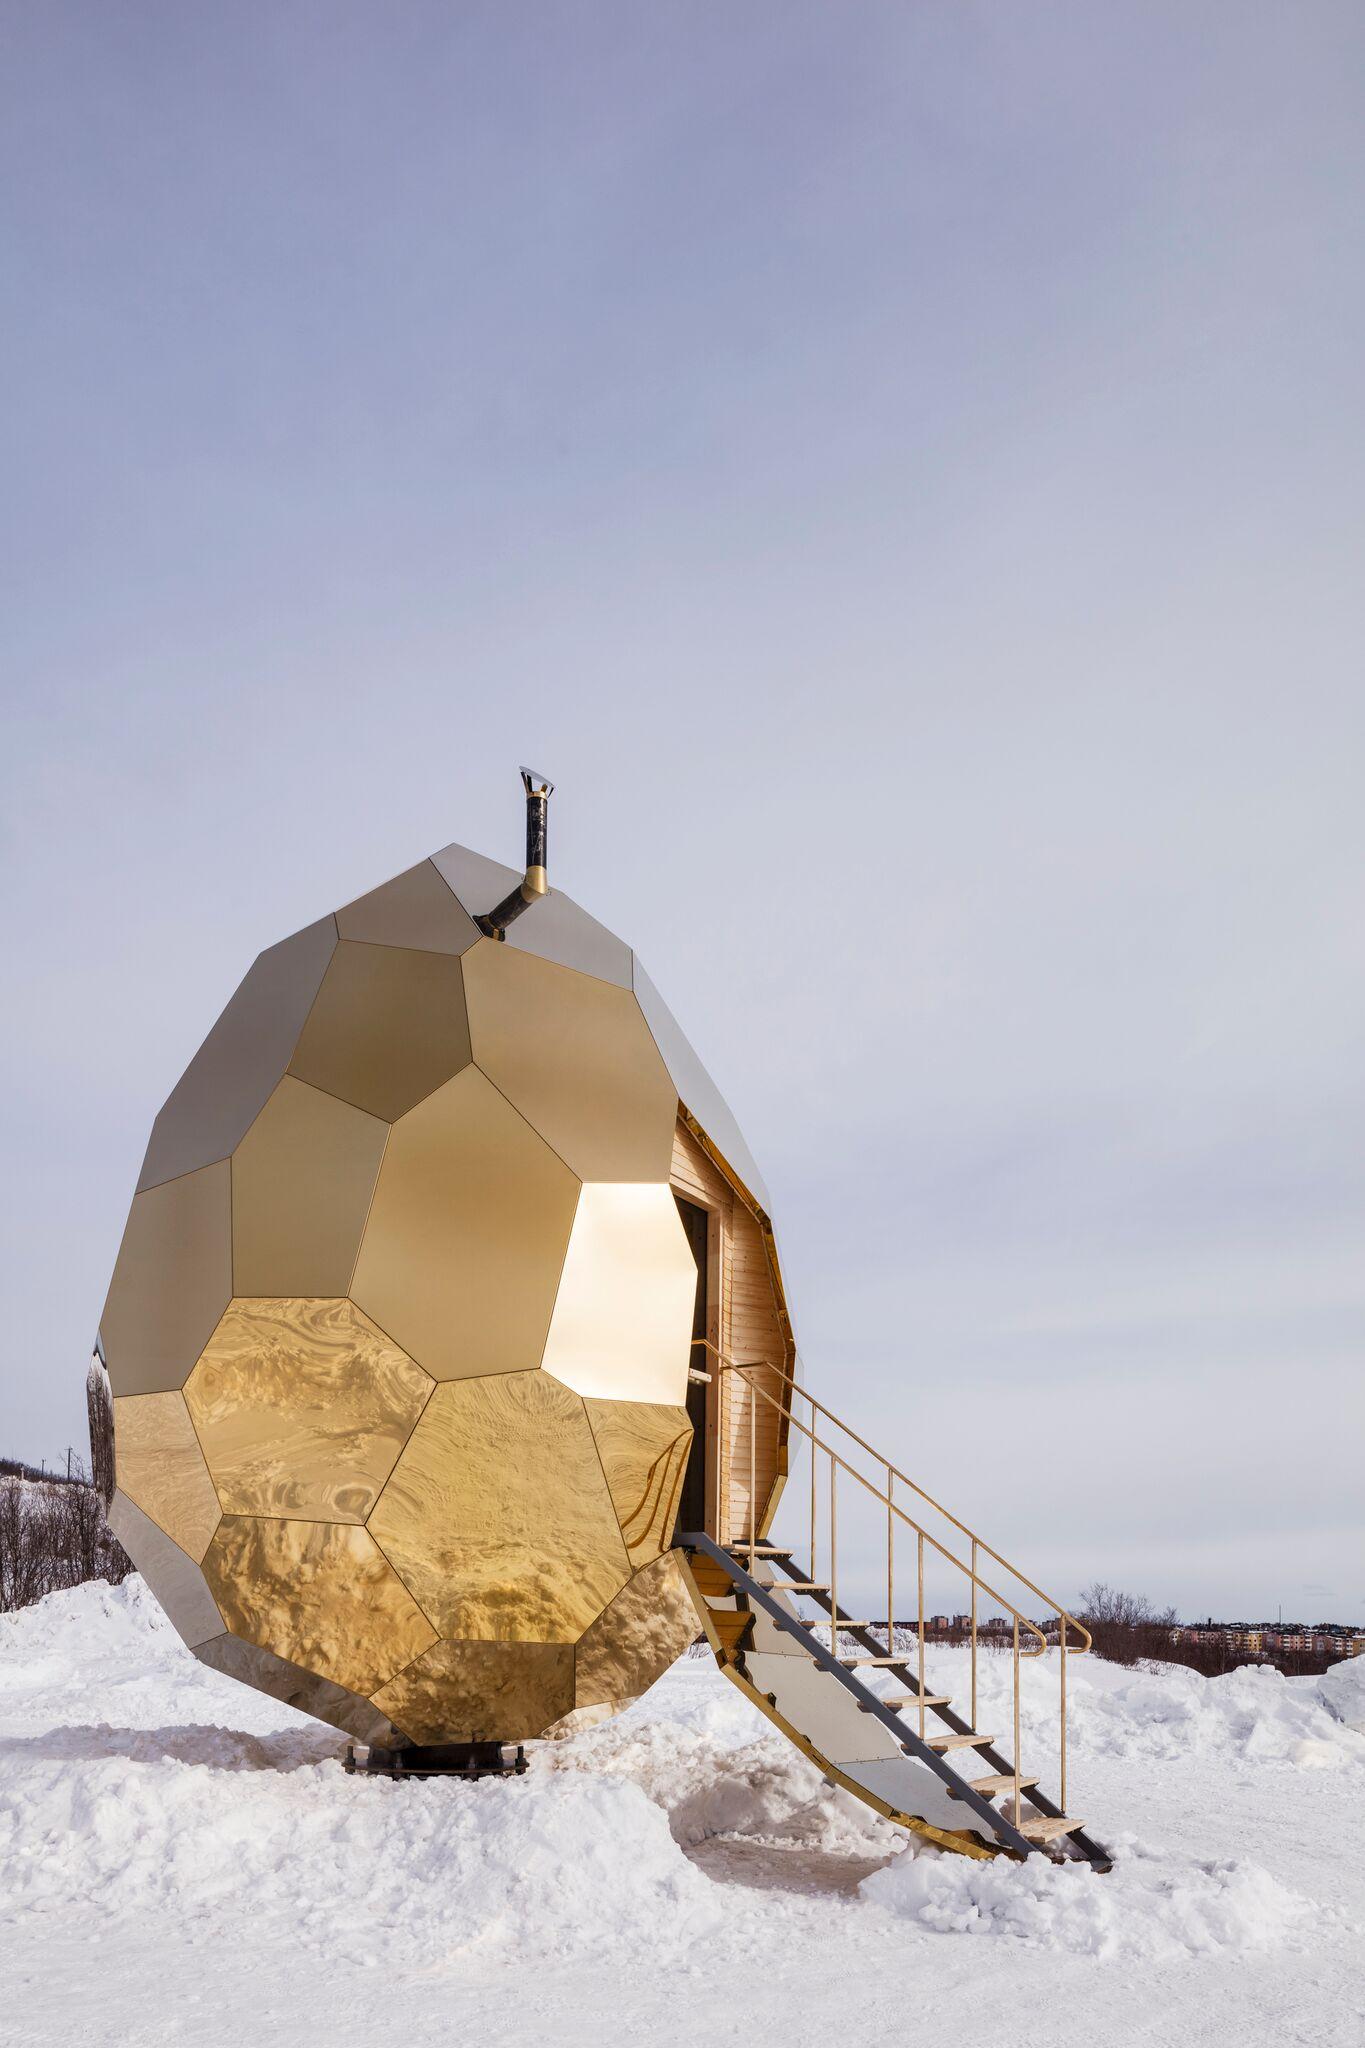 Egg shaped sauna